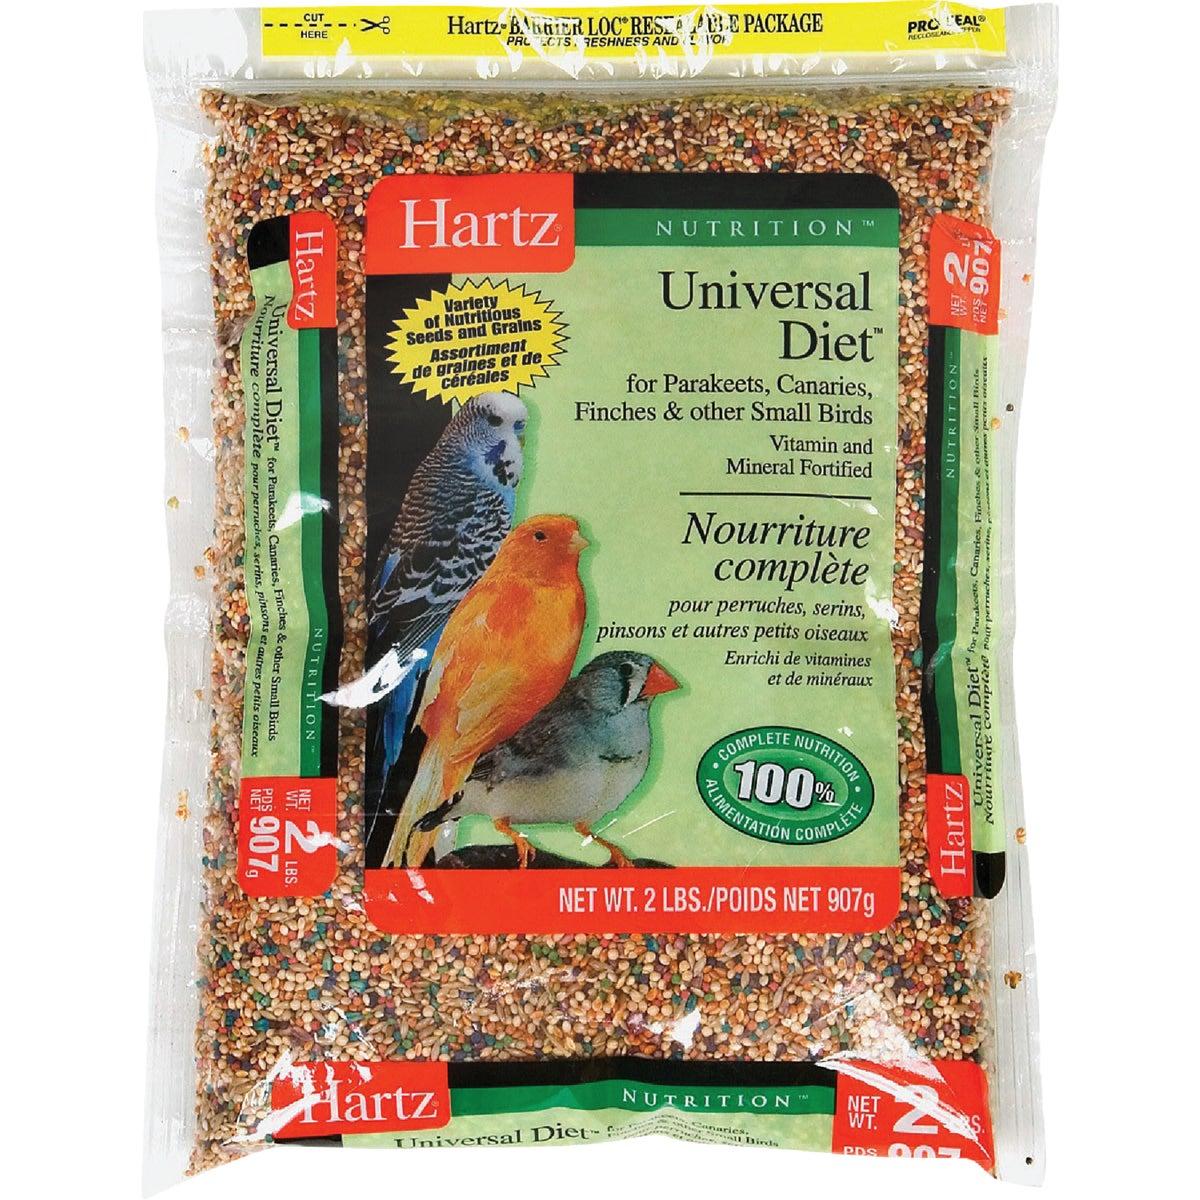 2LB SMALL BIRD FOOD